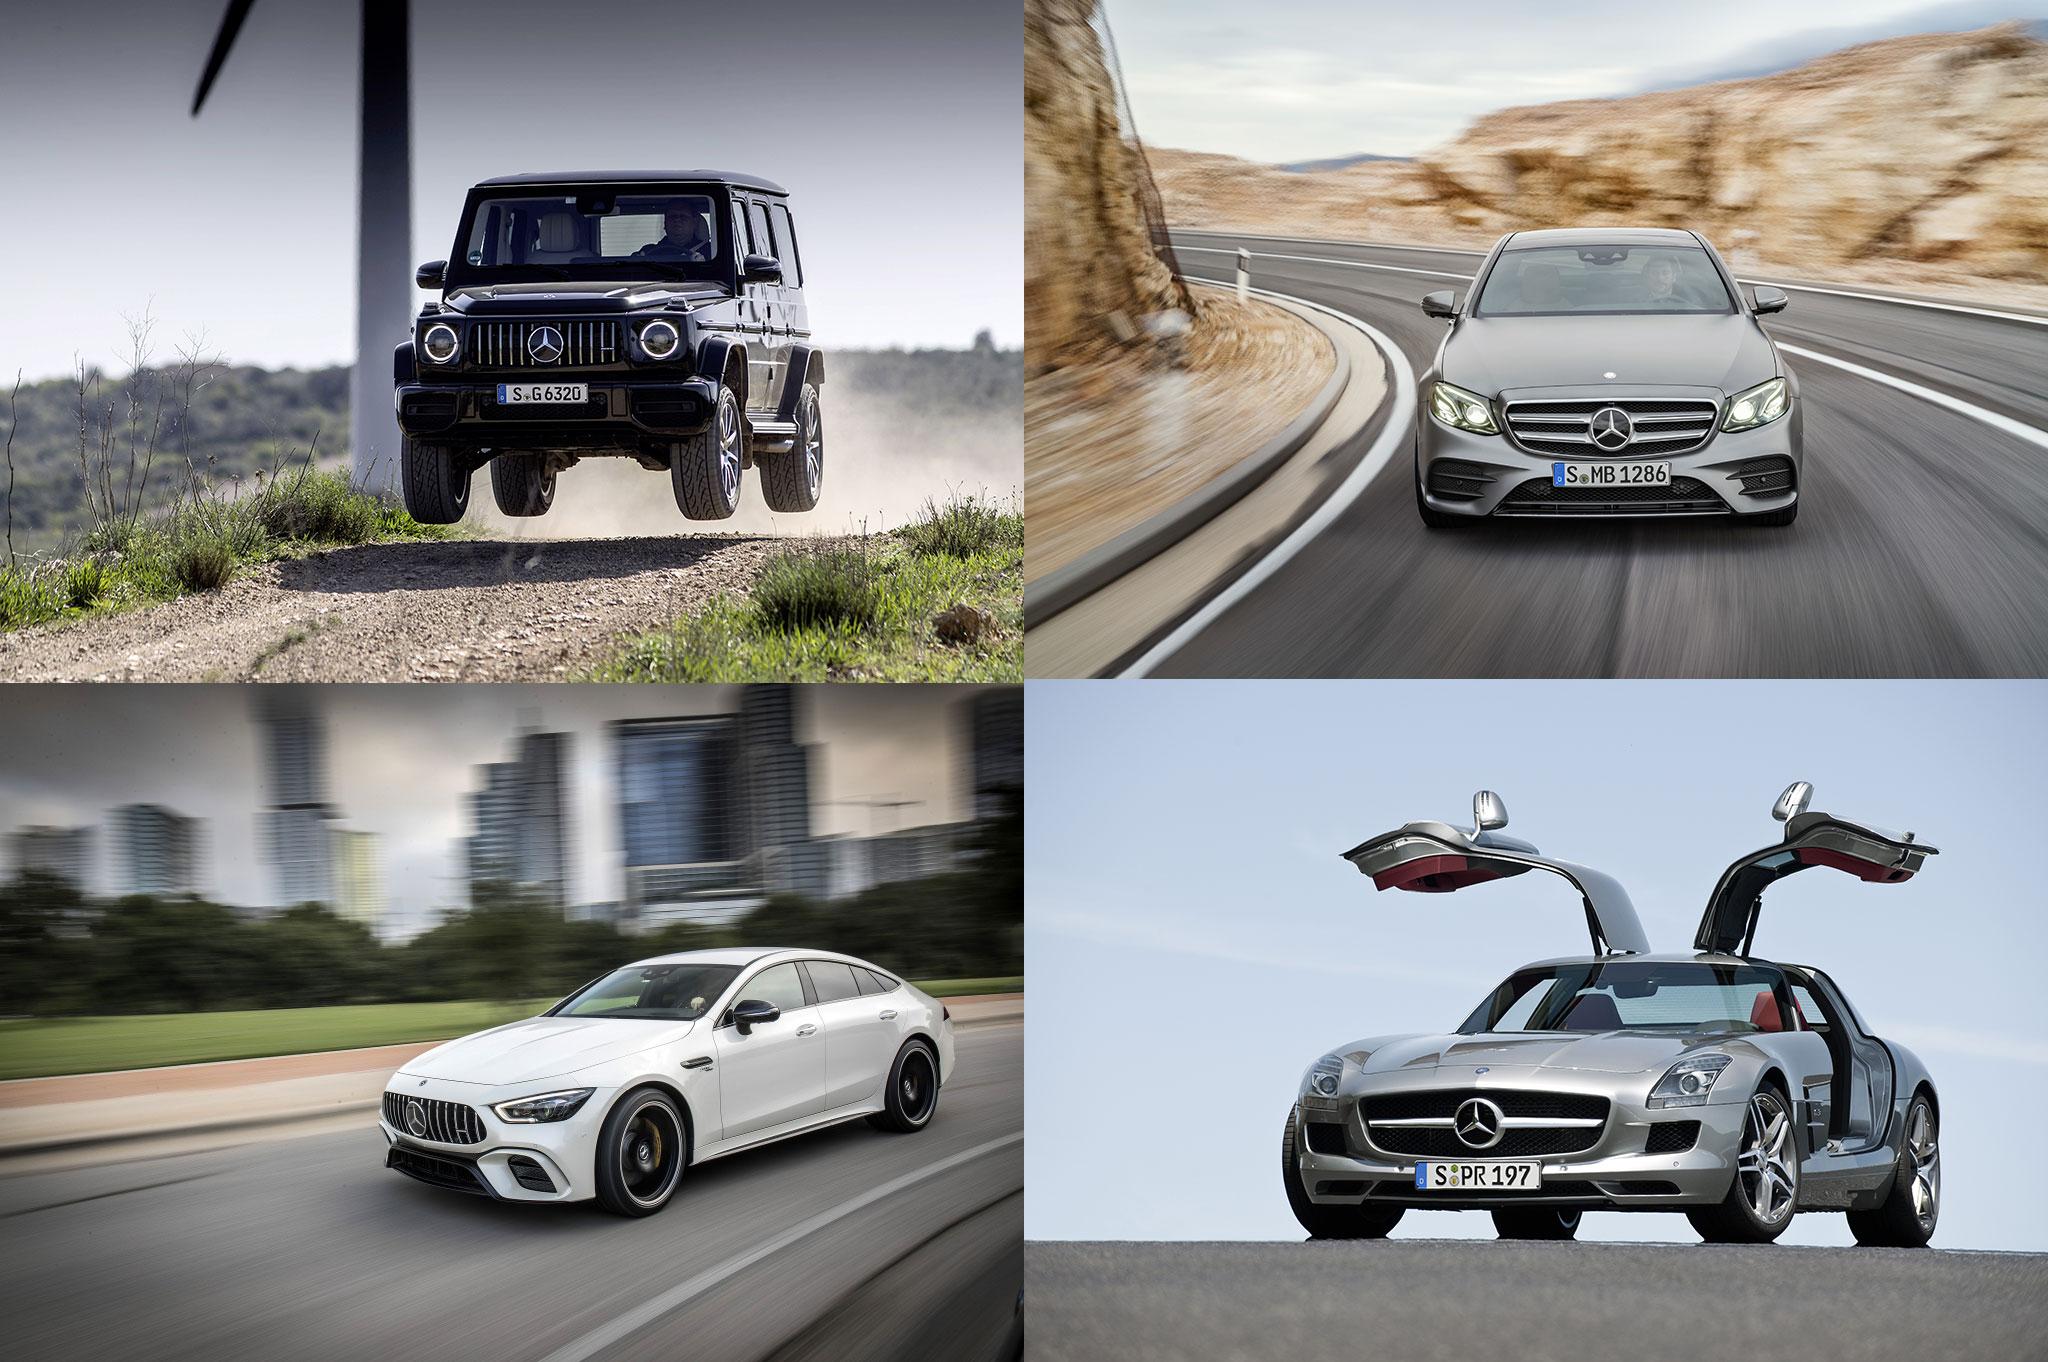 Ini 3 Mercedes-Benz Favorit Pilihan Jurnalis Otomotif Indonesia